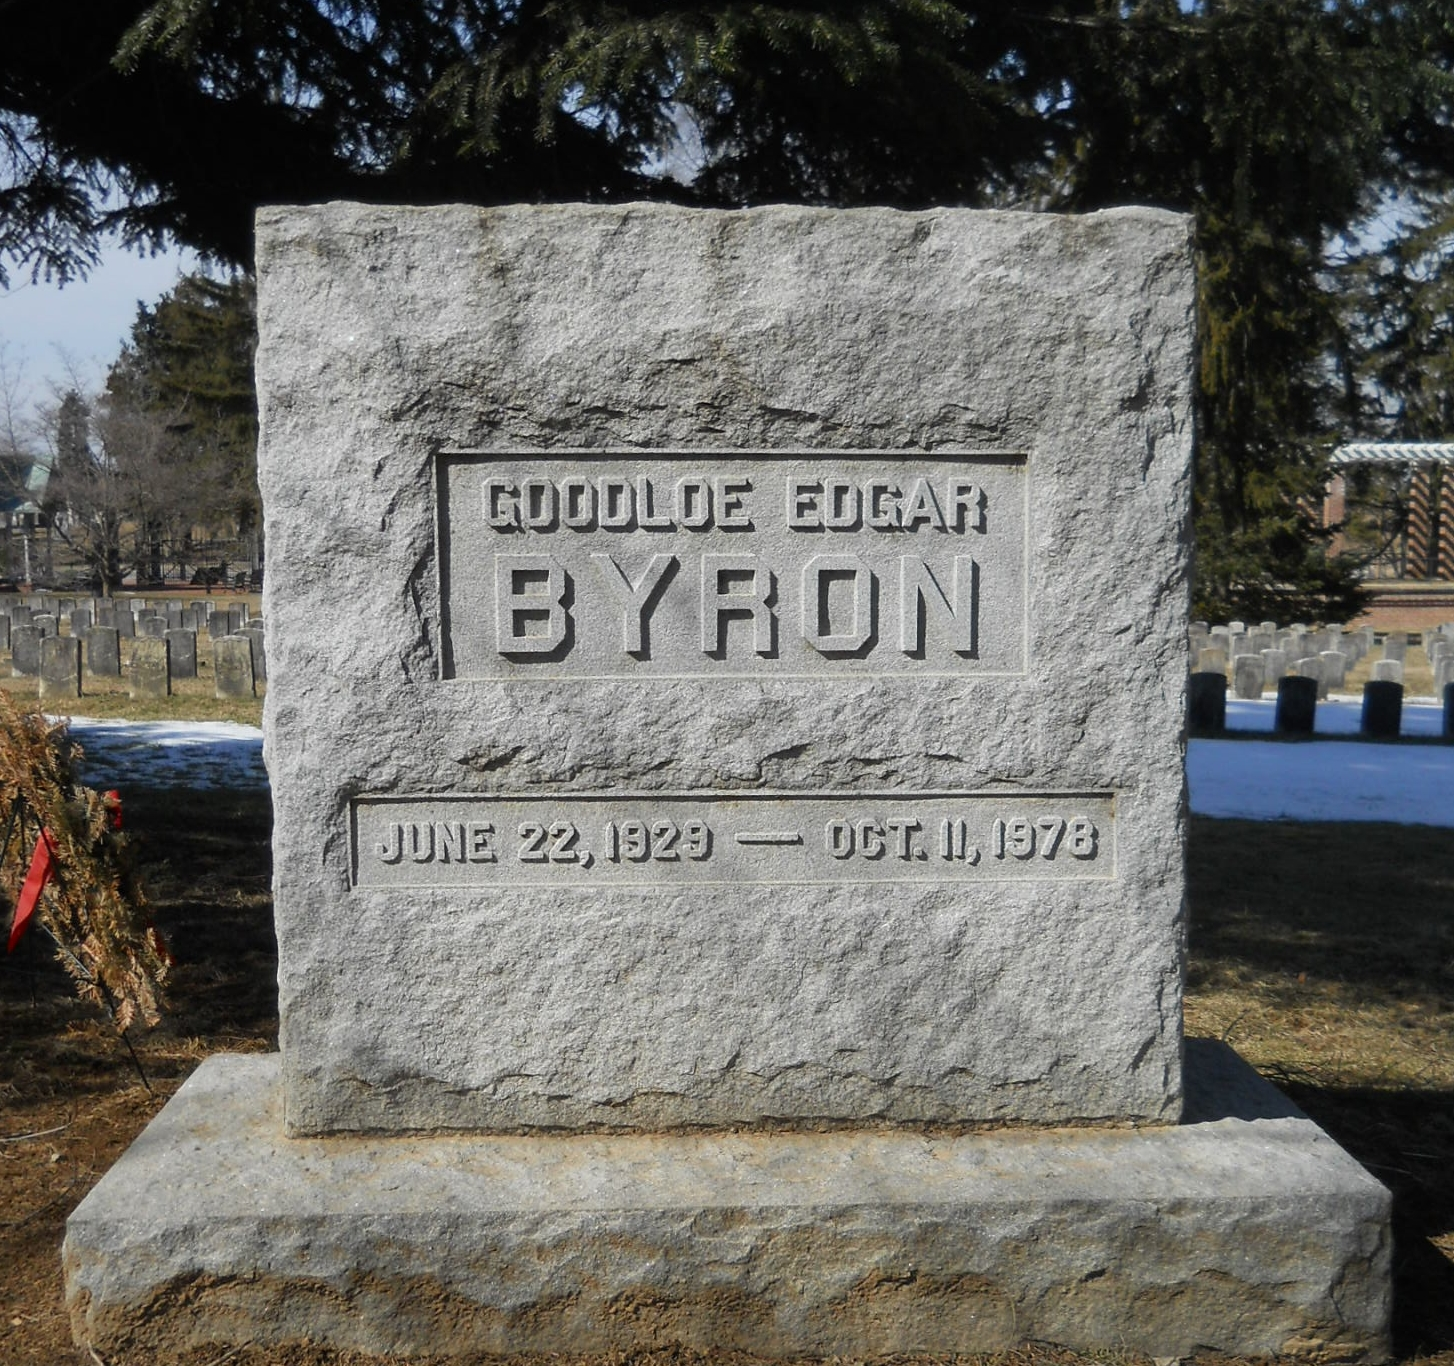 Goodloe Edgar Byron